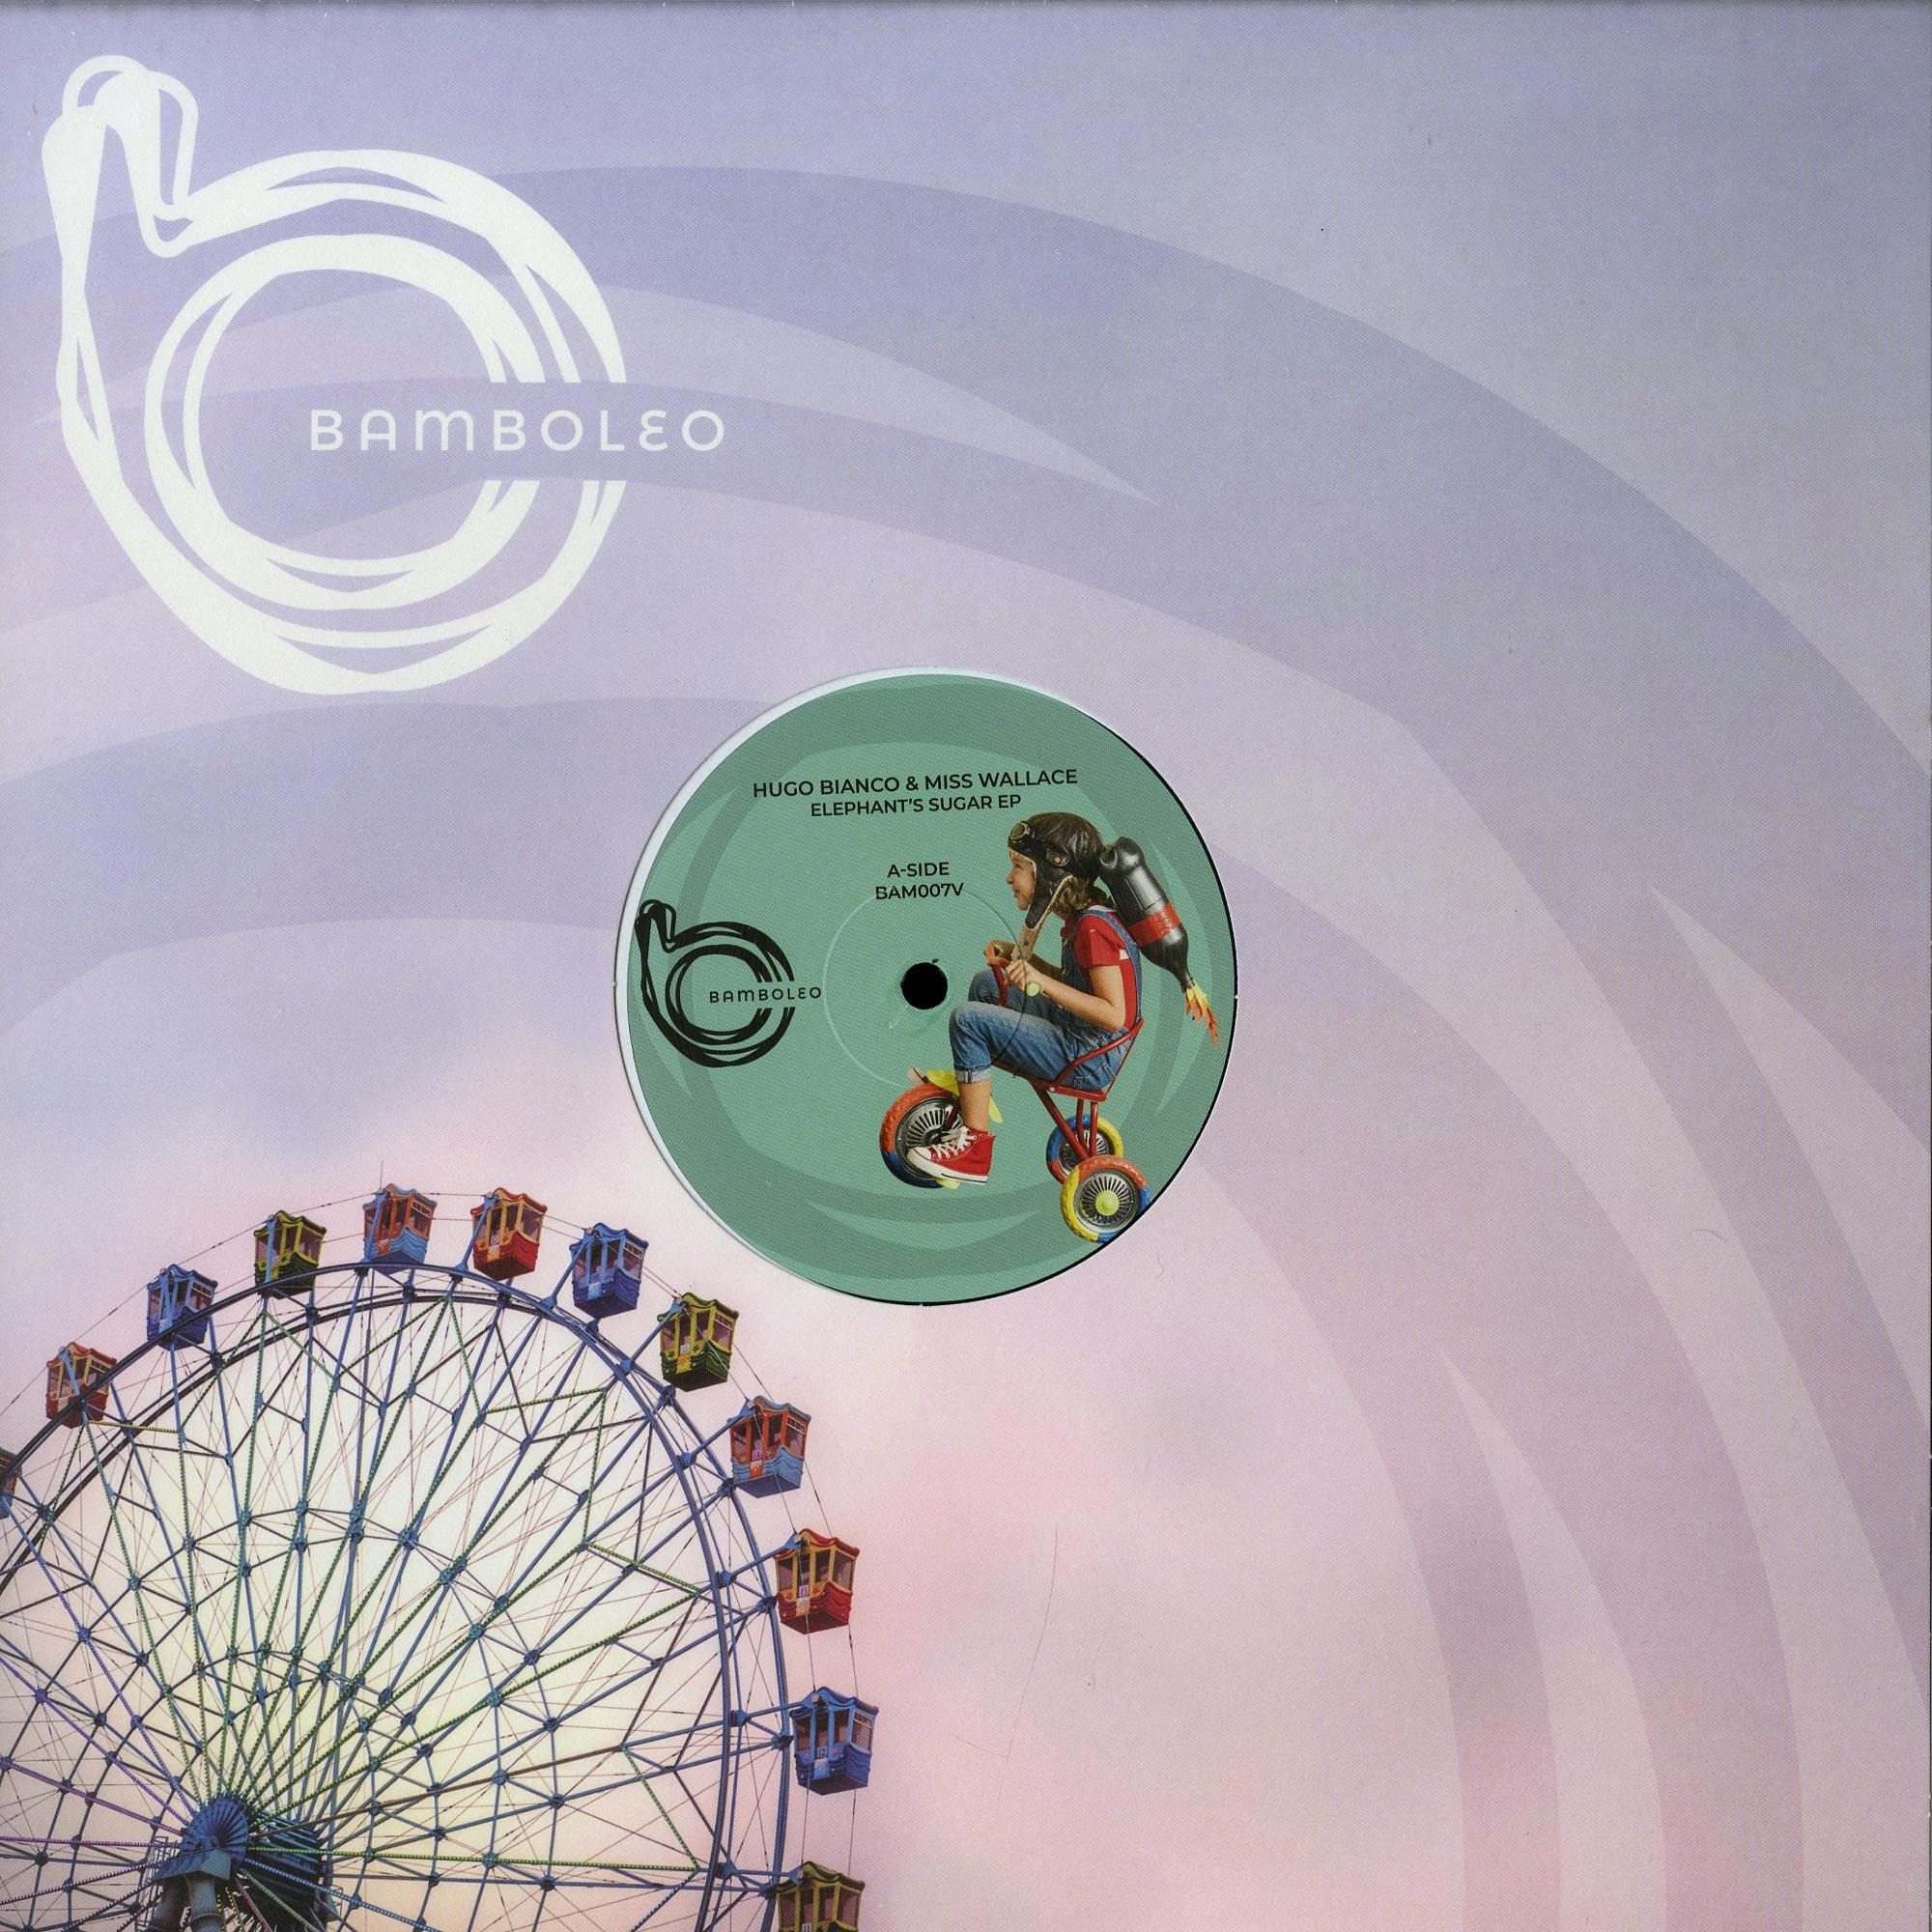 Hugo Bianco &Miss Wallace - ELEPHANTS SUGAR EP